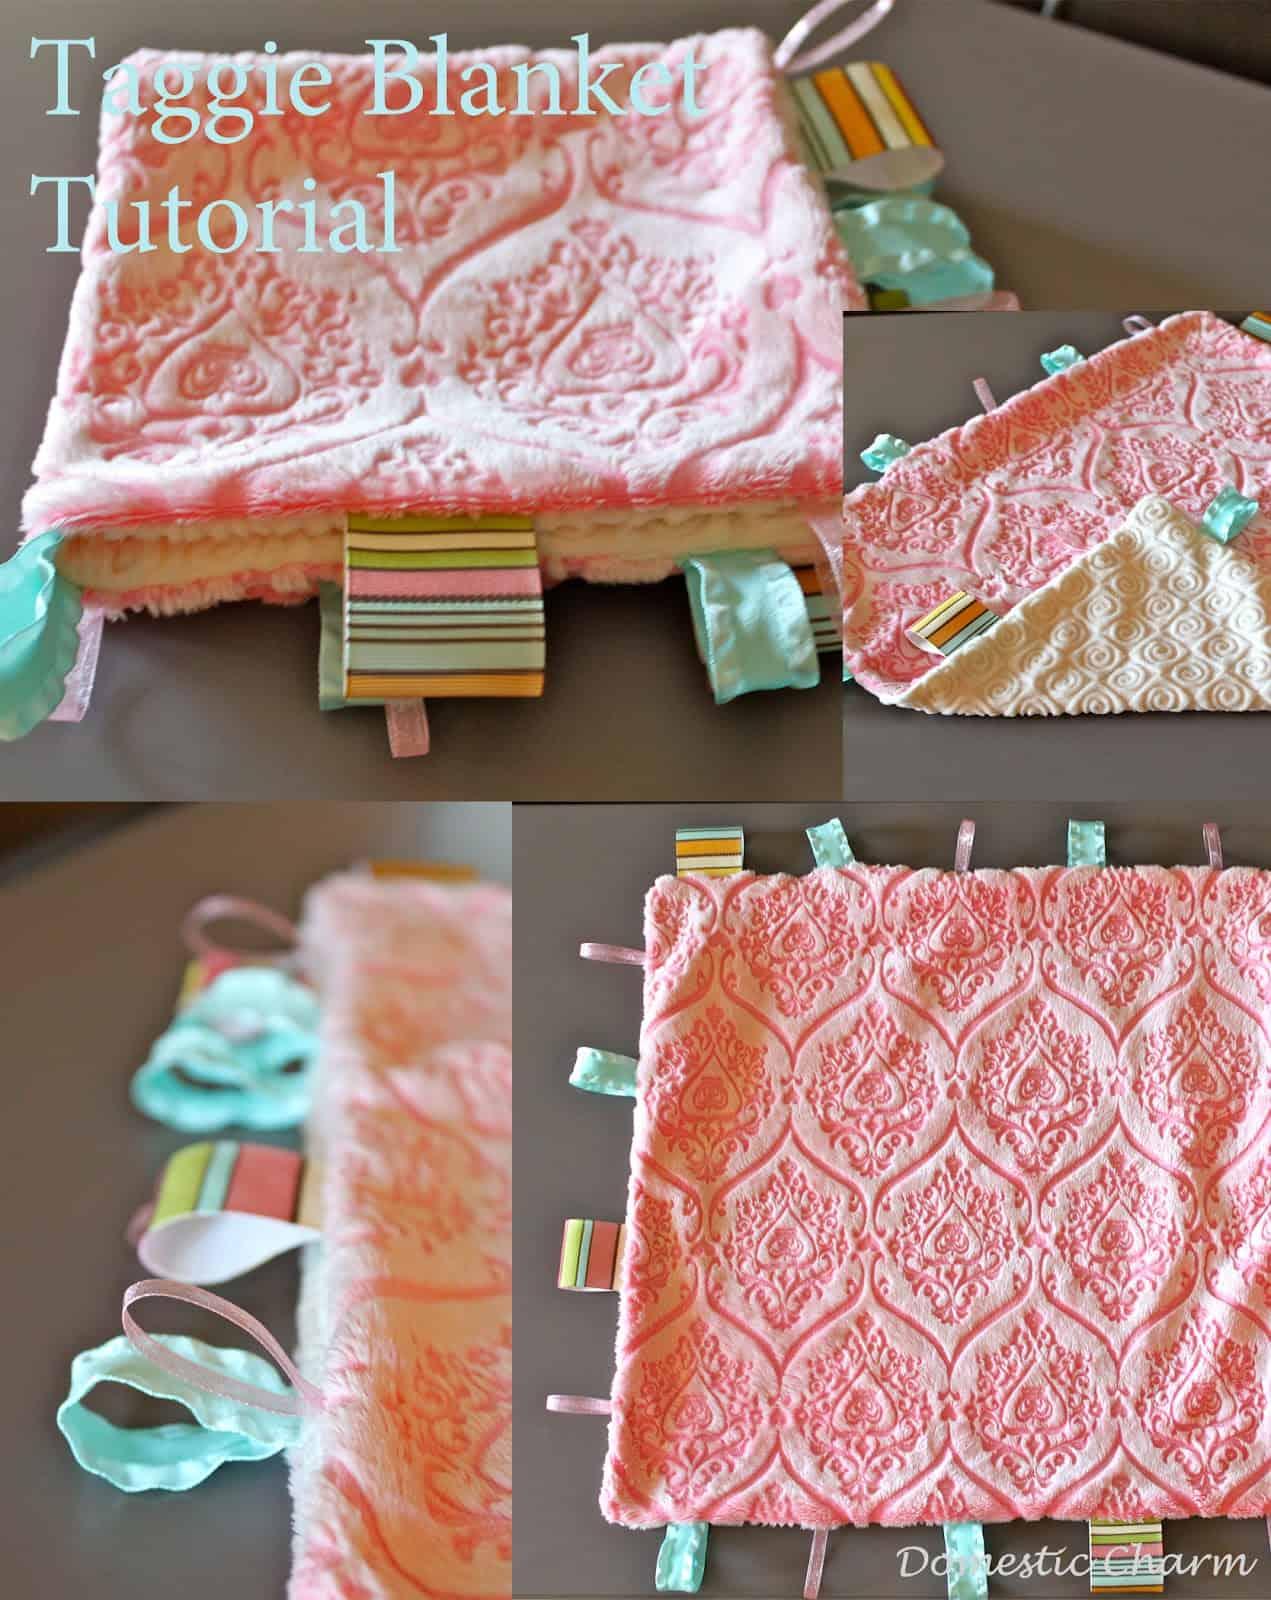 Ribbon taggie blanket